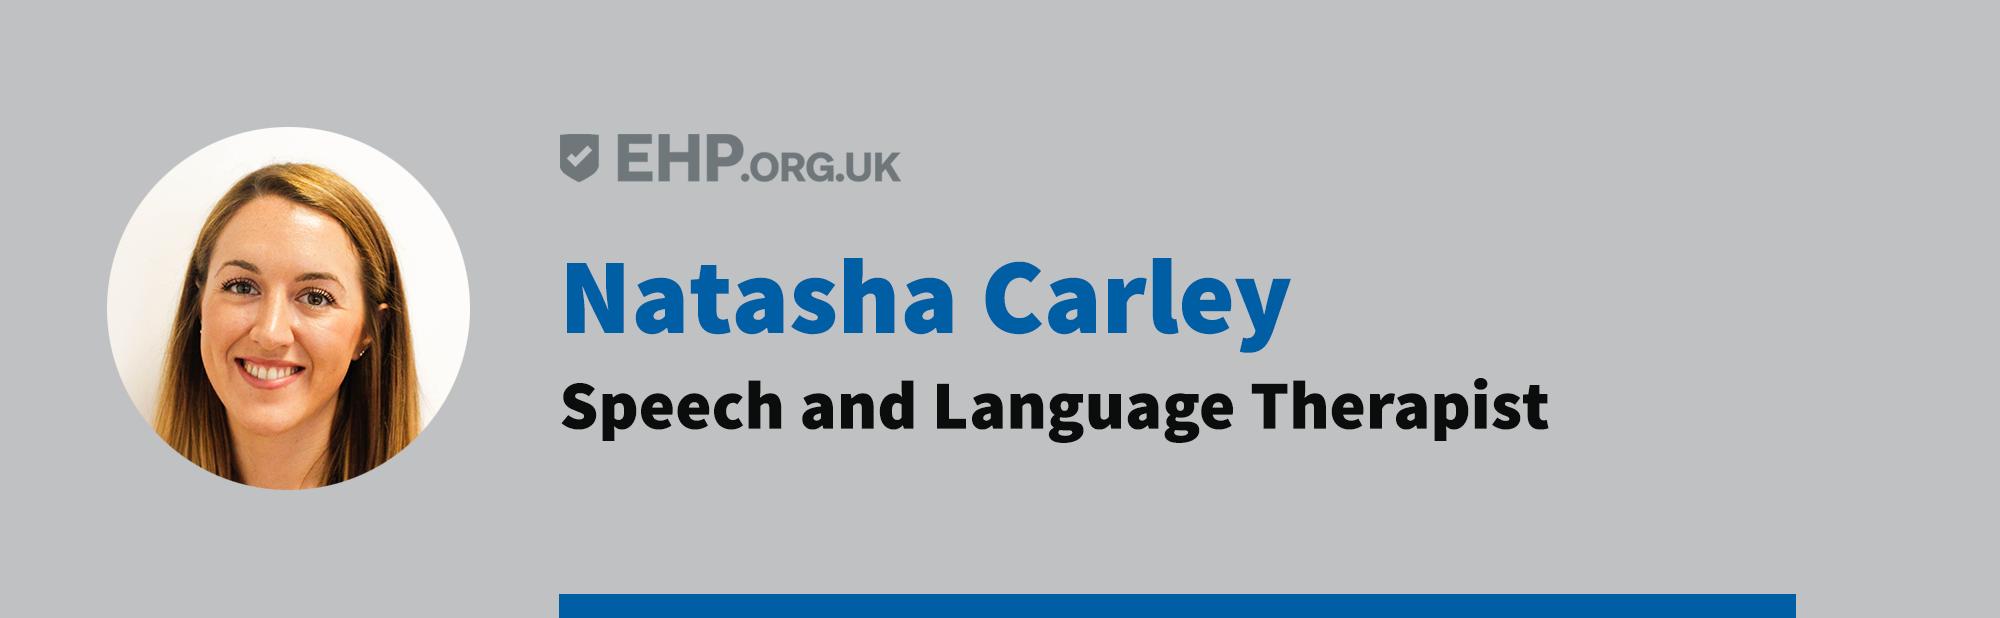 Natasha Carley - Speech and Language Therapist